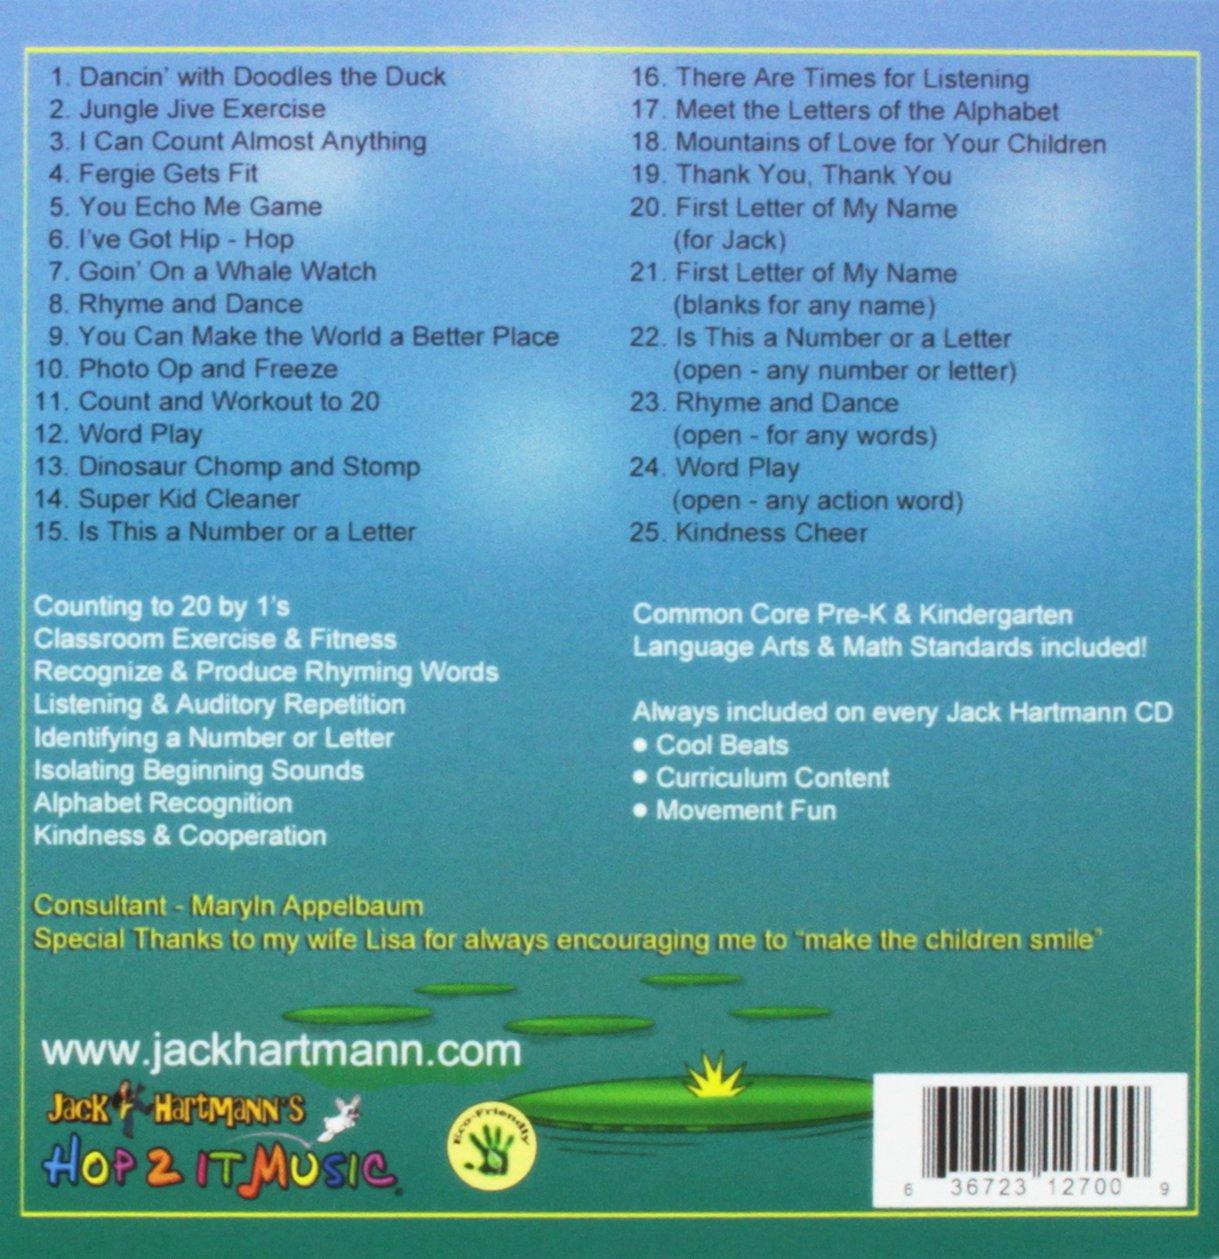 Jack Hartmann Jump Jive Jiggle Amazoncom Music